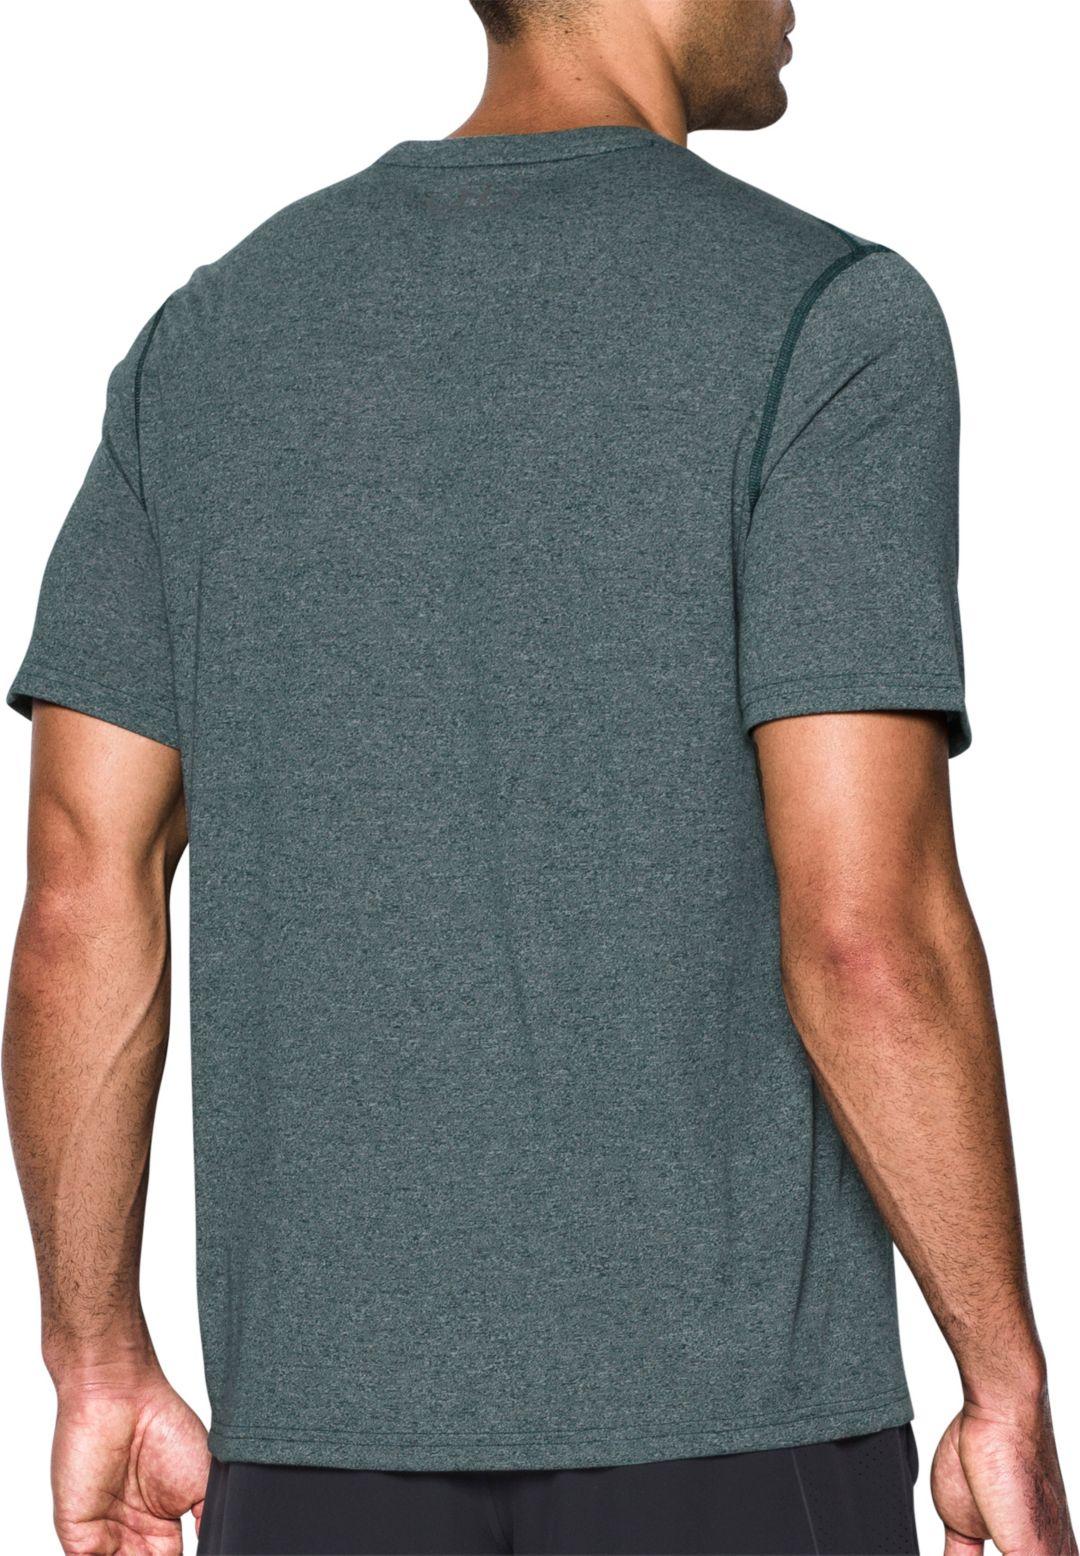 194b0544a Under Armour Men's Threadborne Siro Heather Print T-Shirt | DICK'S ...